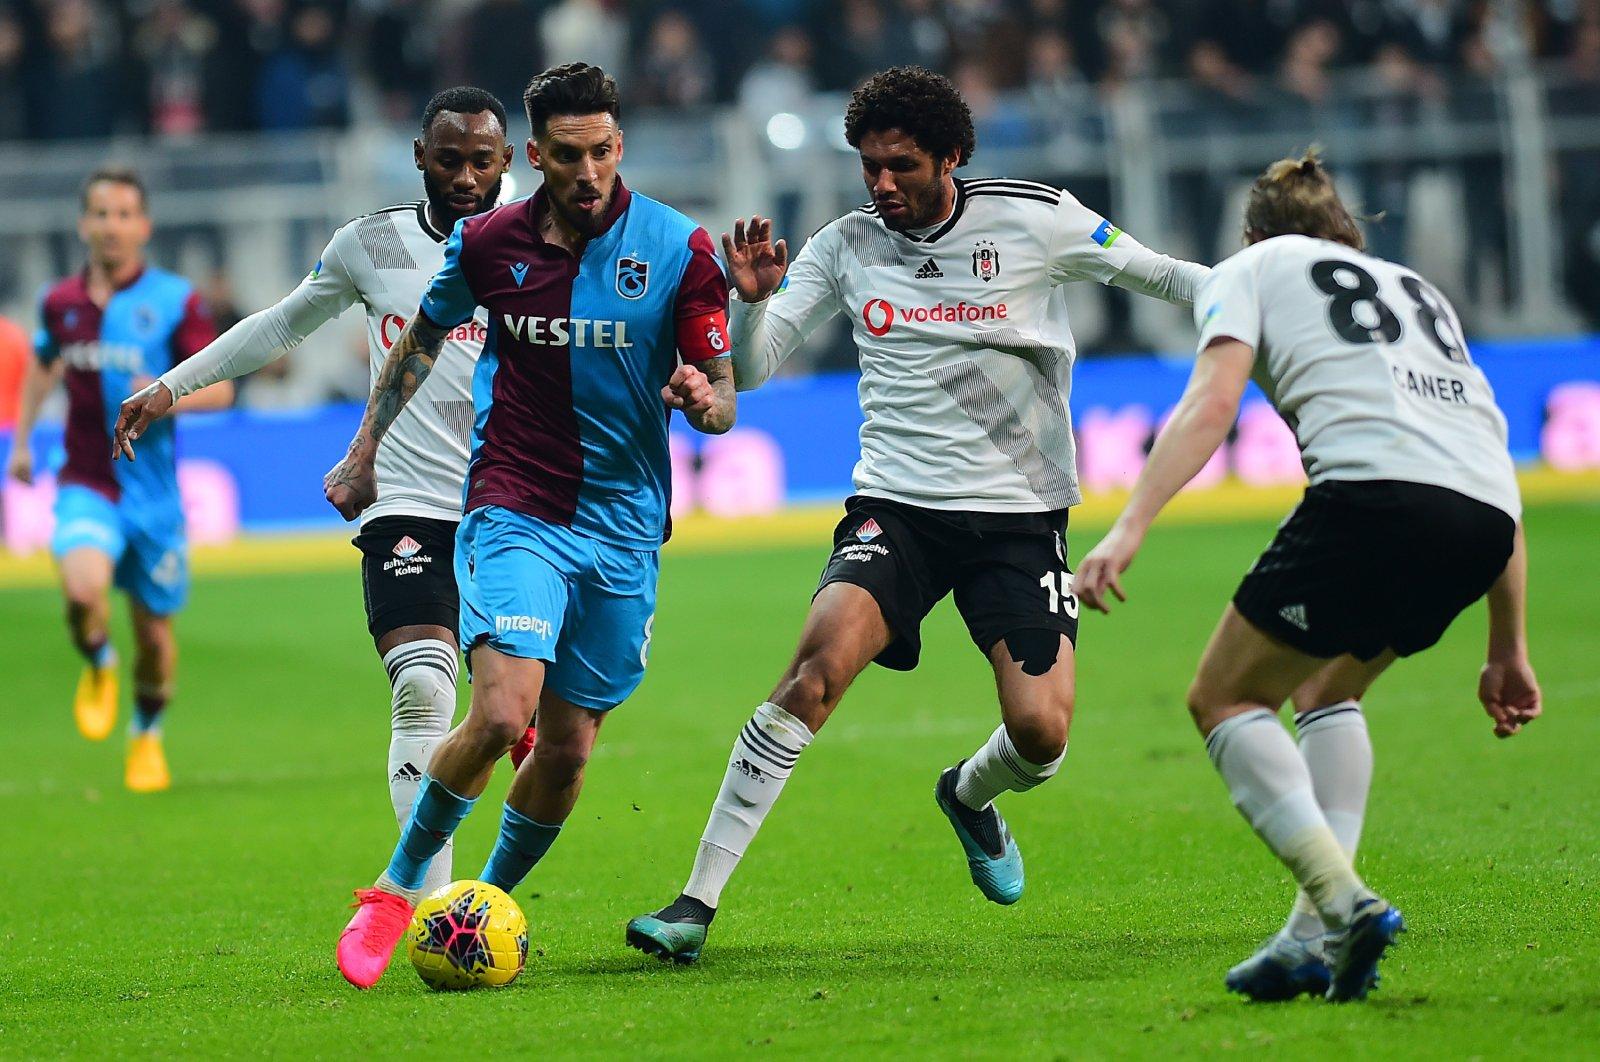 Trabzonspor's Sosa dribbles past Beşiktaş players during a Süper Lig match in Istanbul, Turkey, Feb. 22, 2020. (Photo by Turgut Doğan)